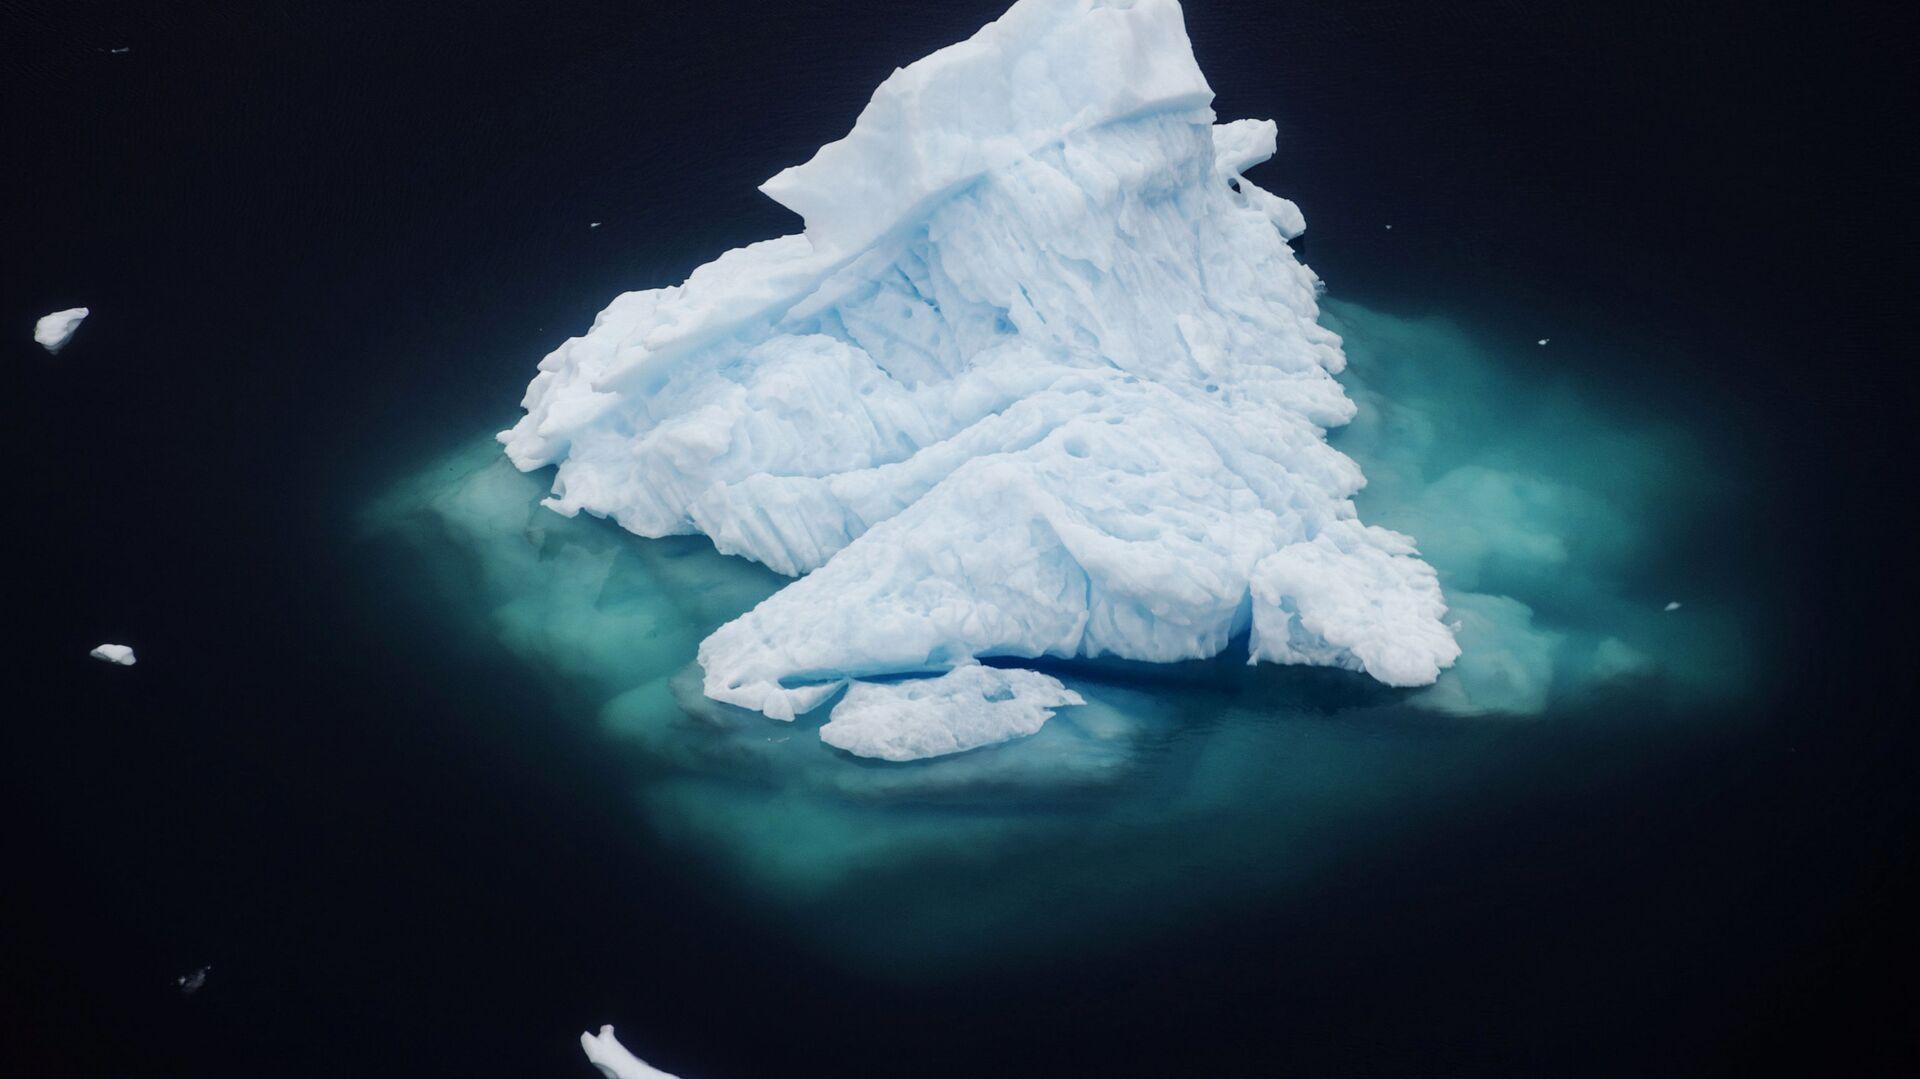 Un iceberg in Groenlandia - Sputnik Italia, 1920, 15.06.2021